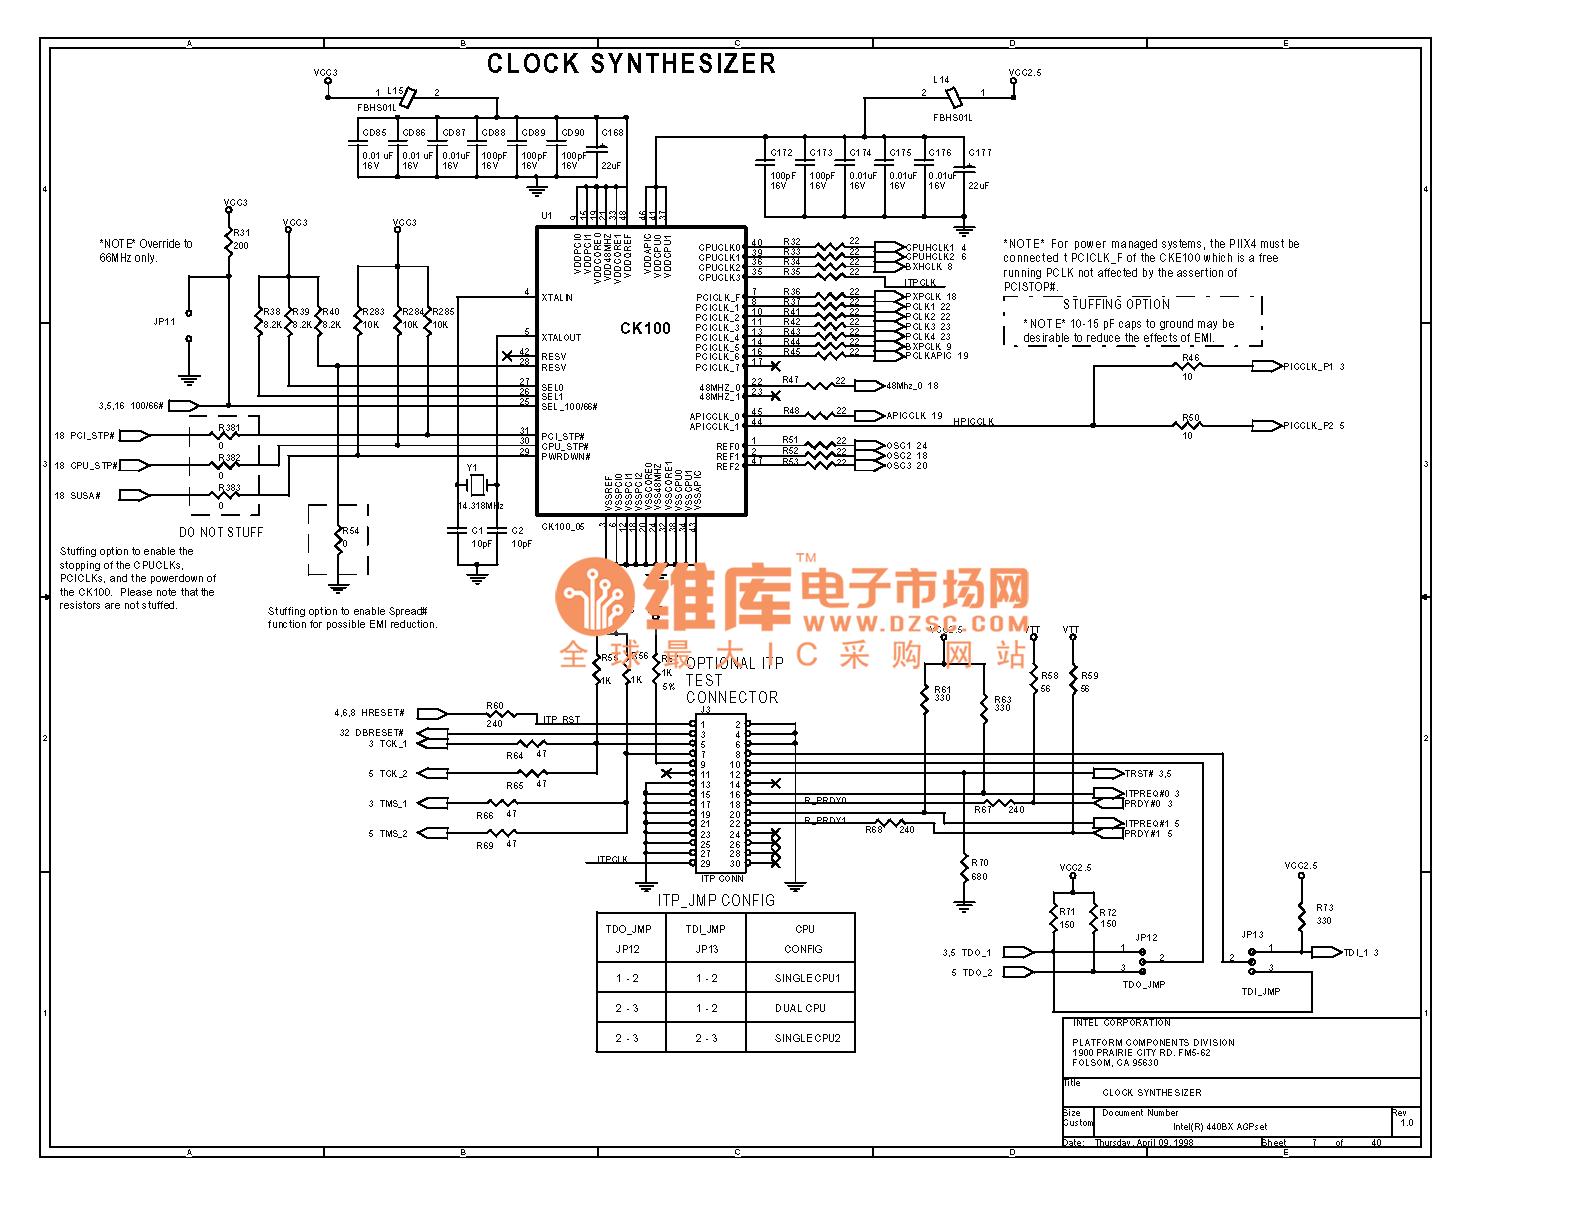 Pc Mainboard Circuit 440bx 07 Computer Related Diagram 19 Computerrelatedcircuit